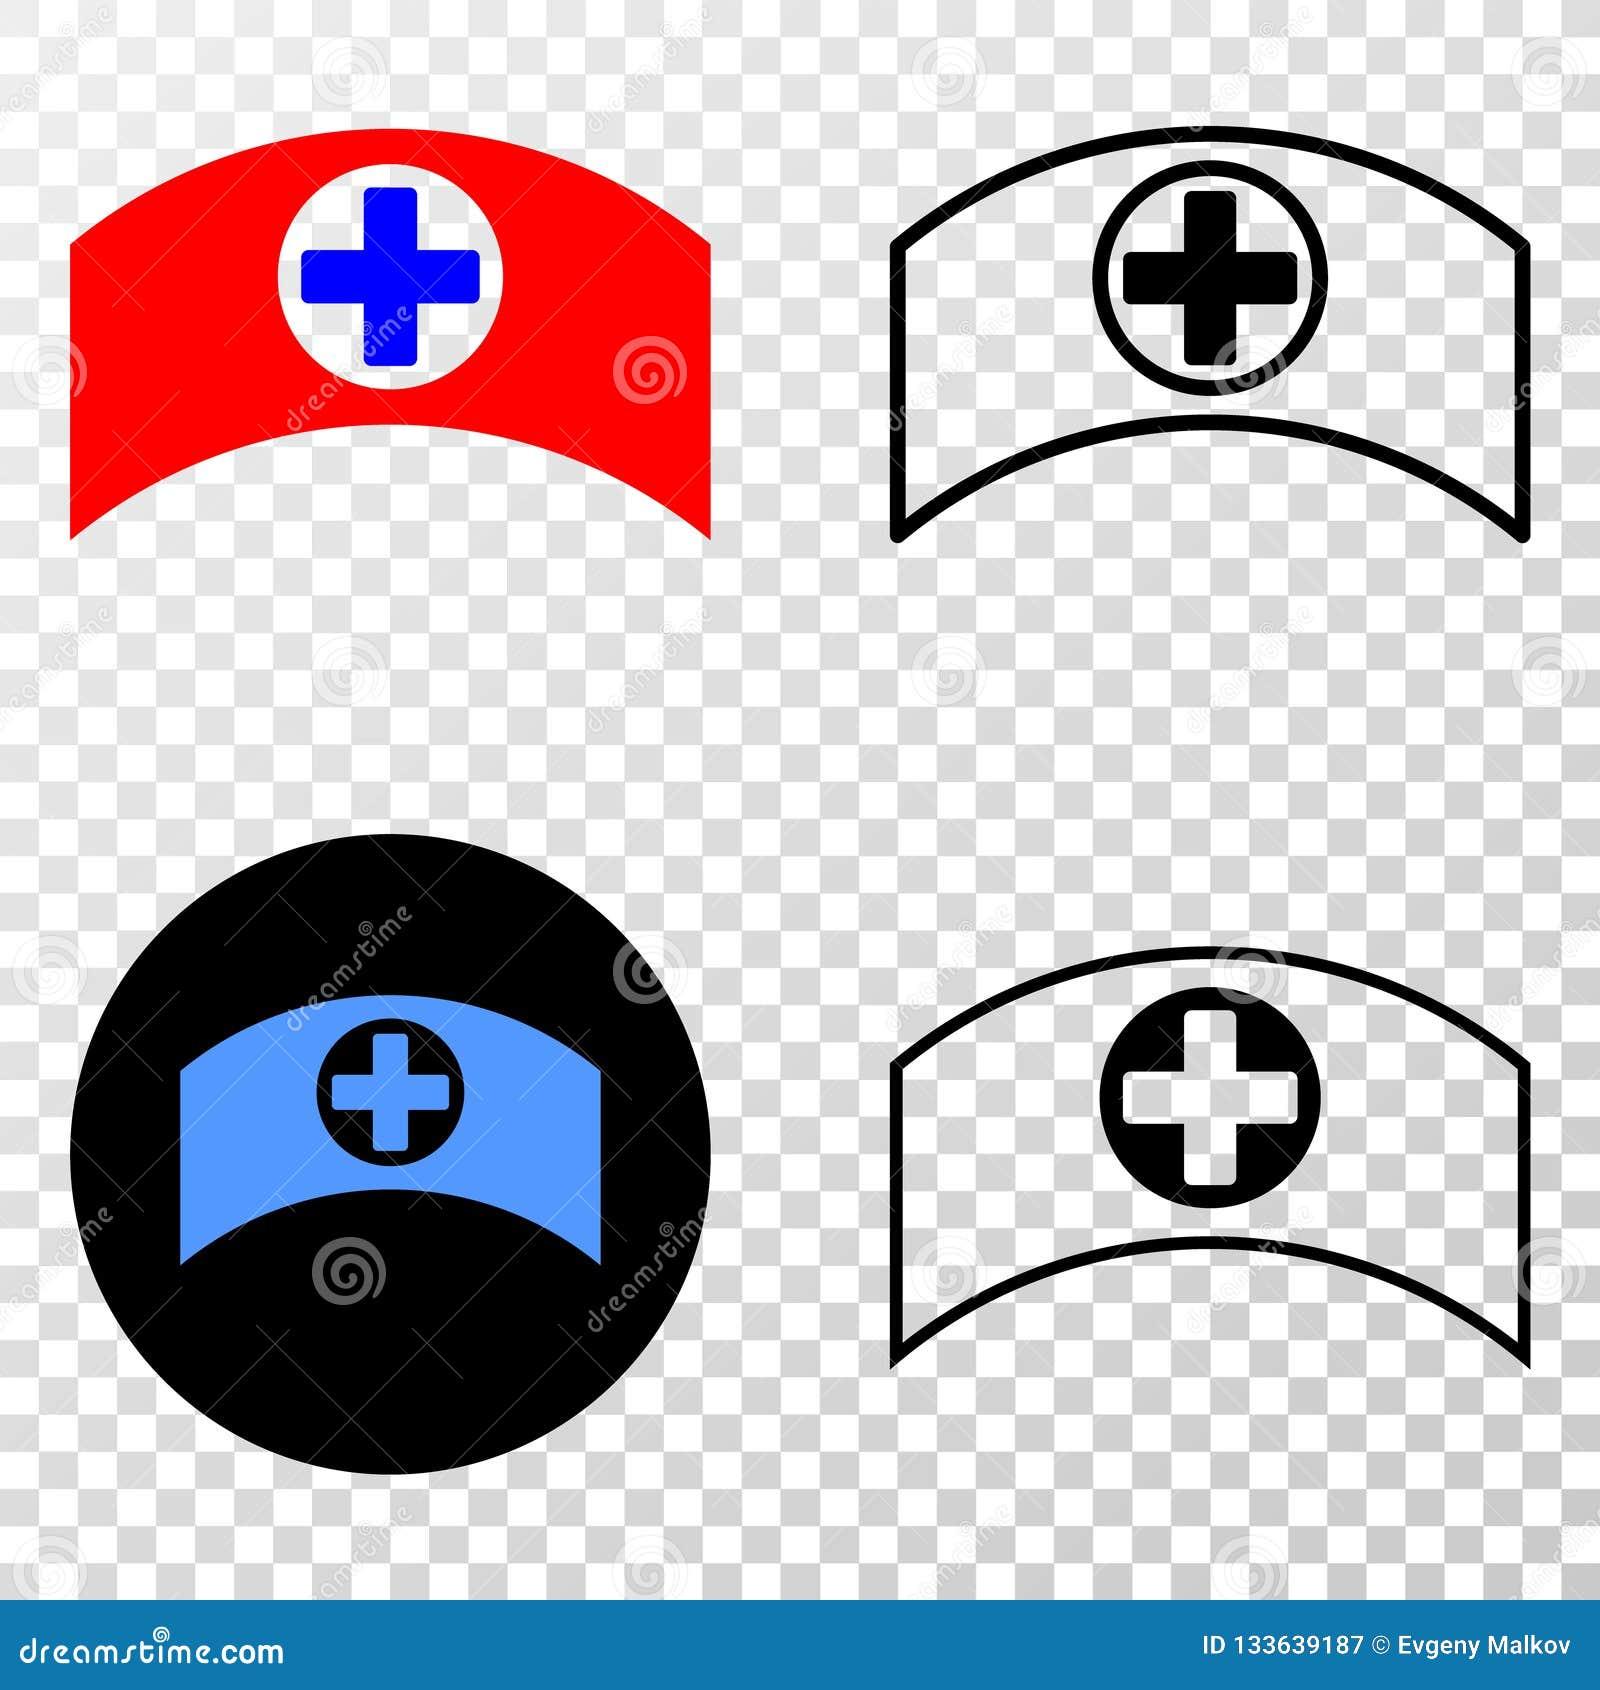 Gradiented拼贴画加点了医疗盖帽和Grunged邮票